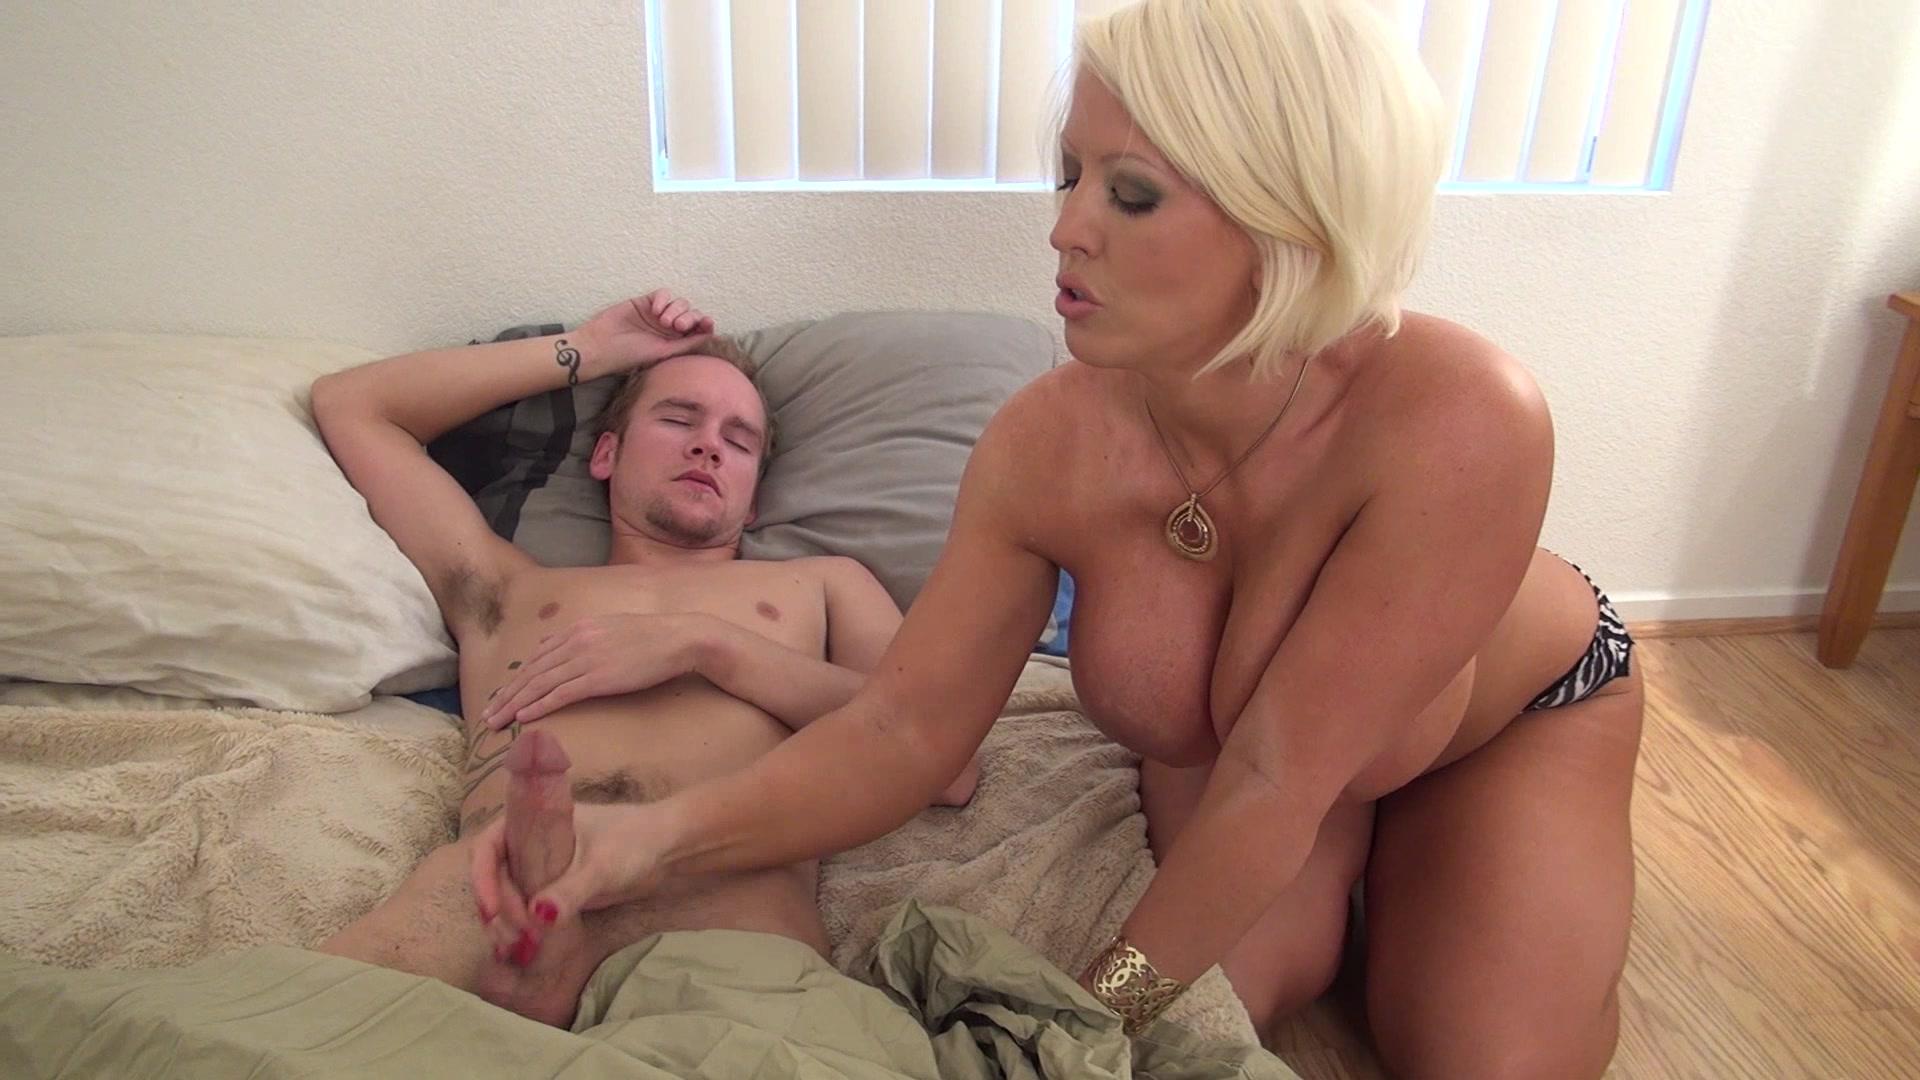 Mother helps son masturbate